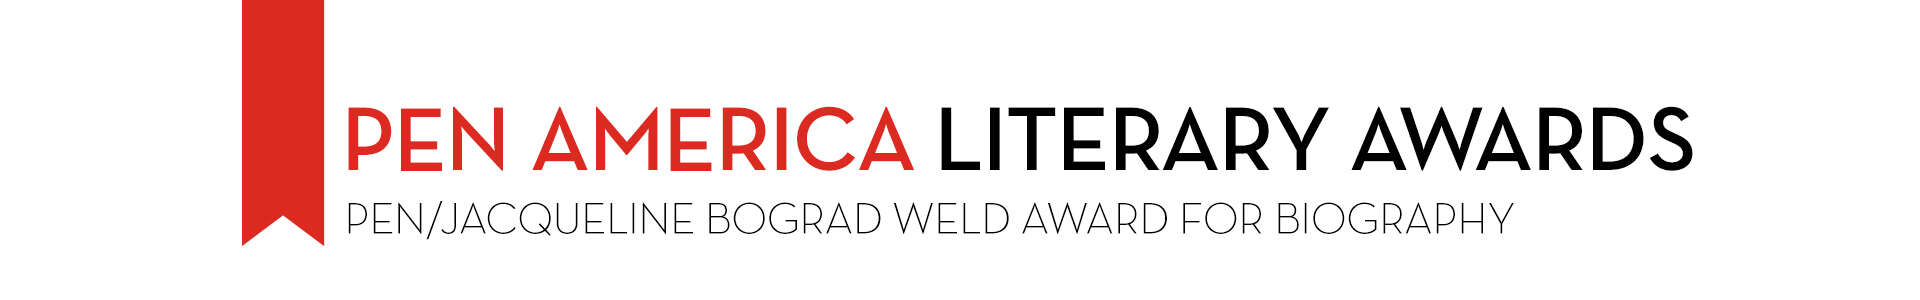 PEN/Jacqueline Bograd Weld Award for Biography